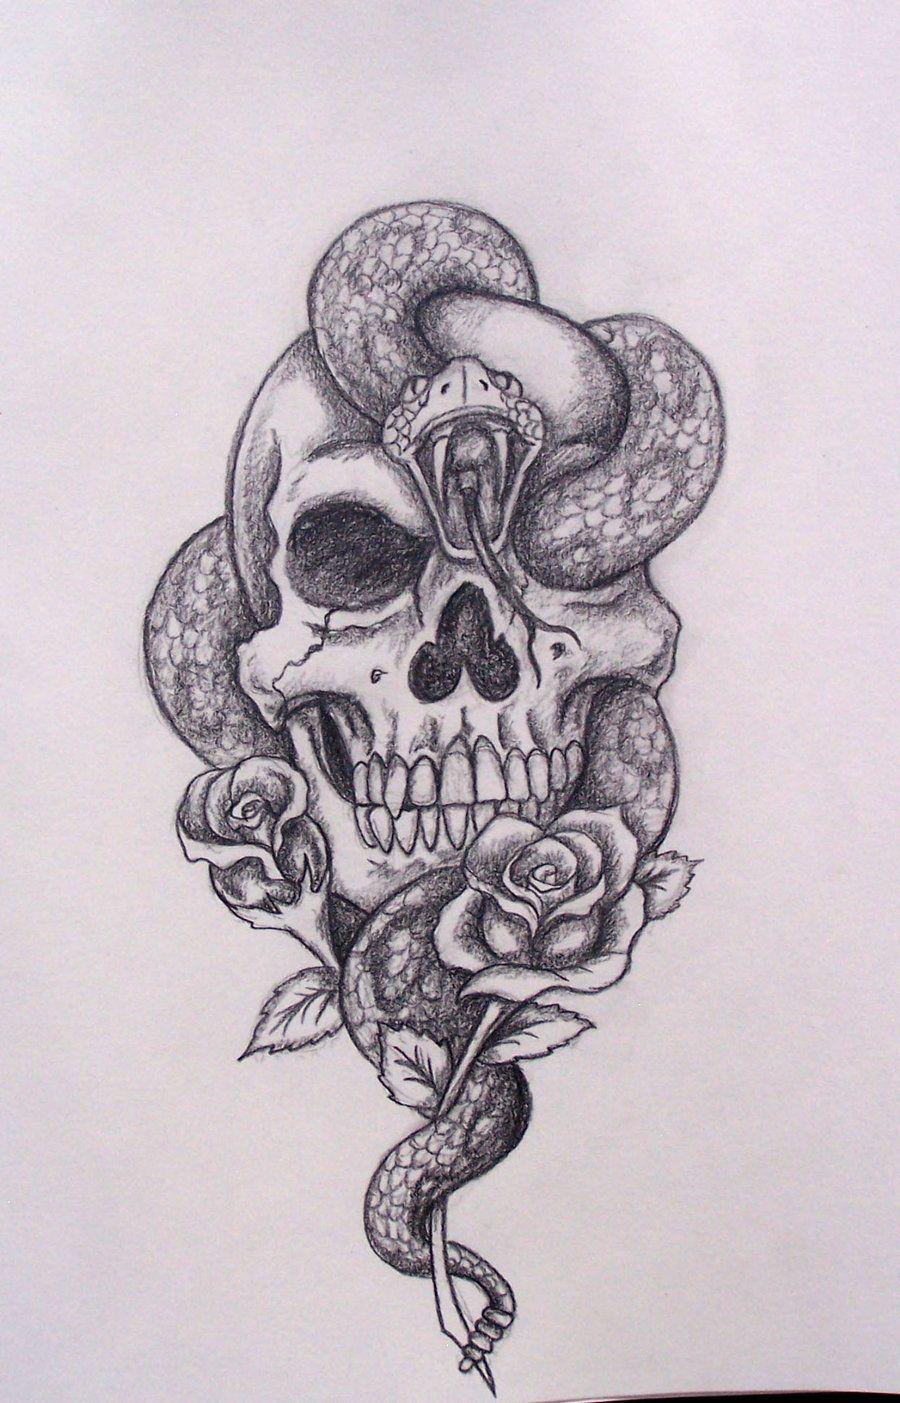 Skull Snake Tattoos : skull, snake, tattoos, Tattoo, Skull, Design,, Drawing,, Tattoos